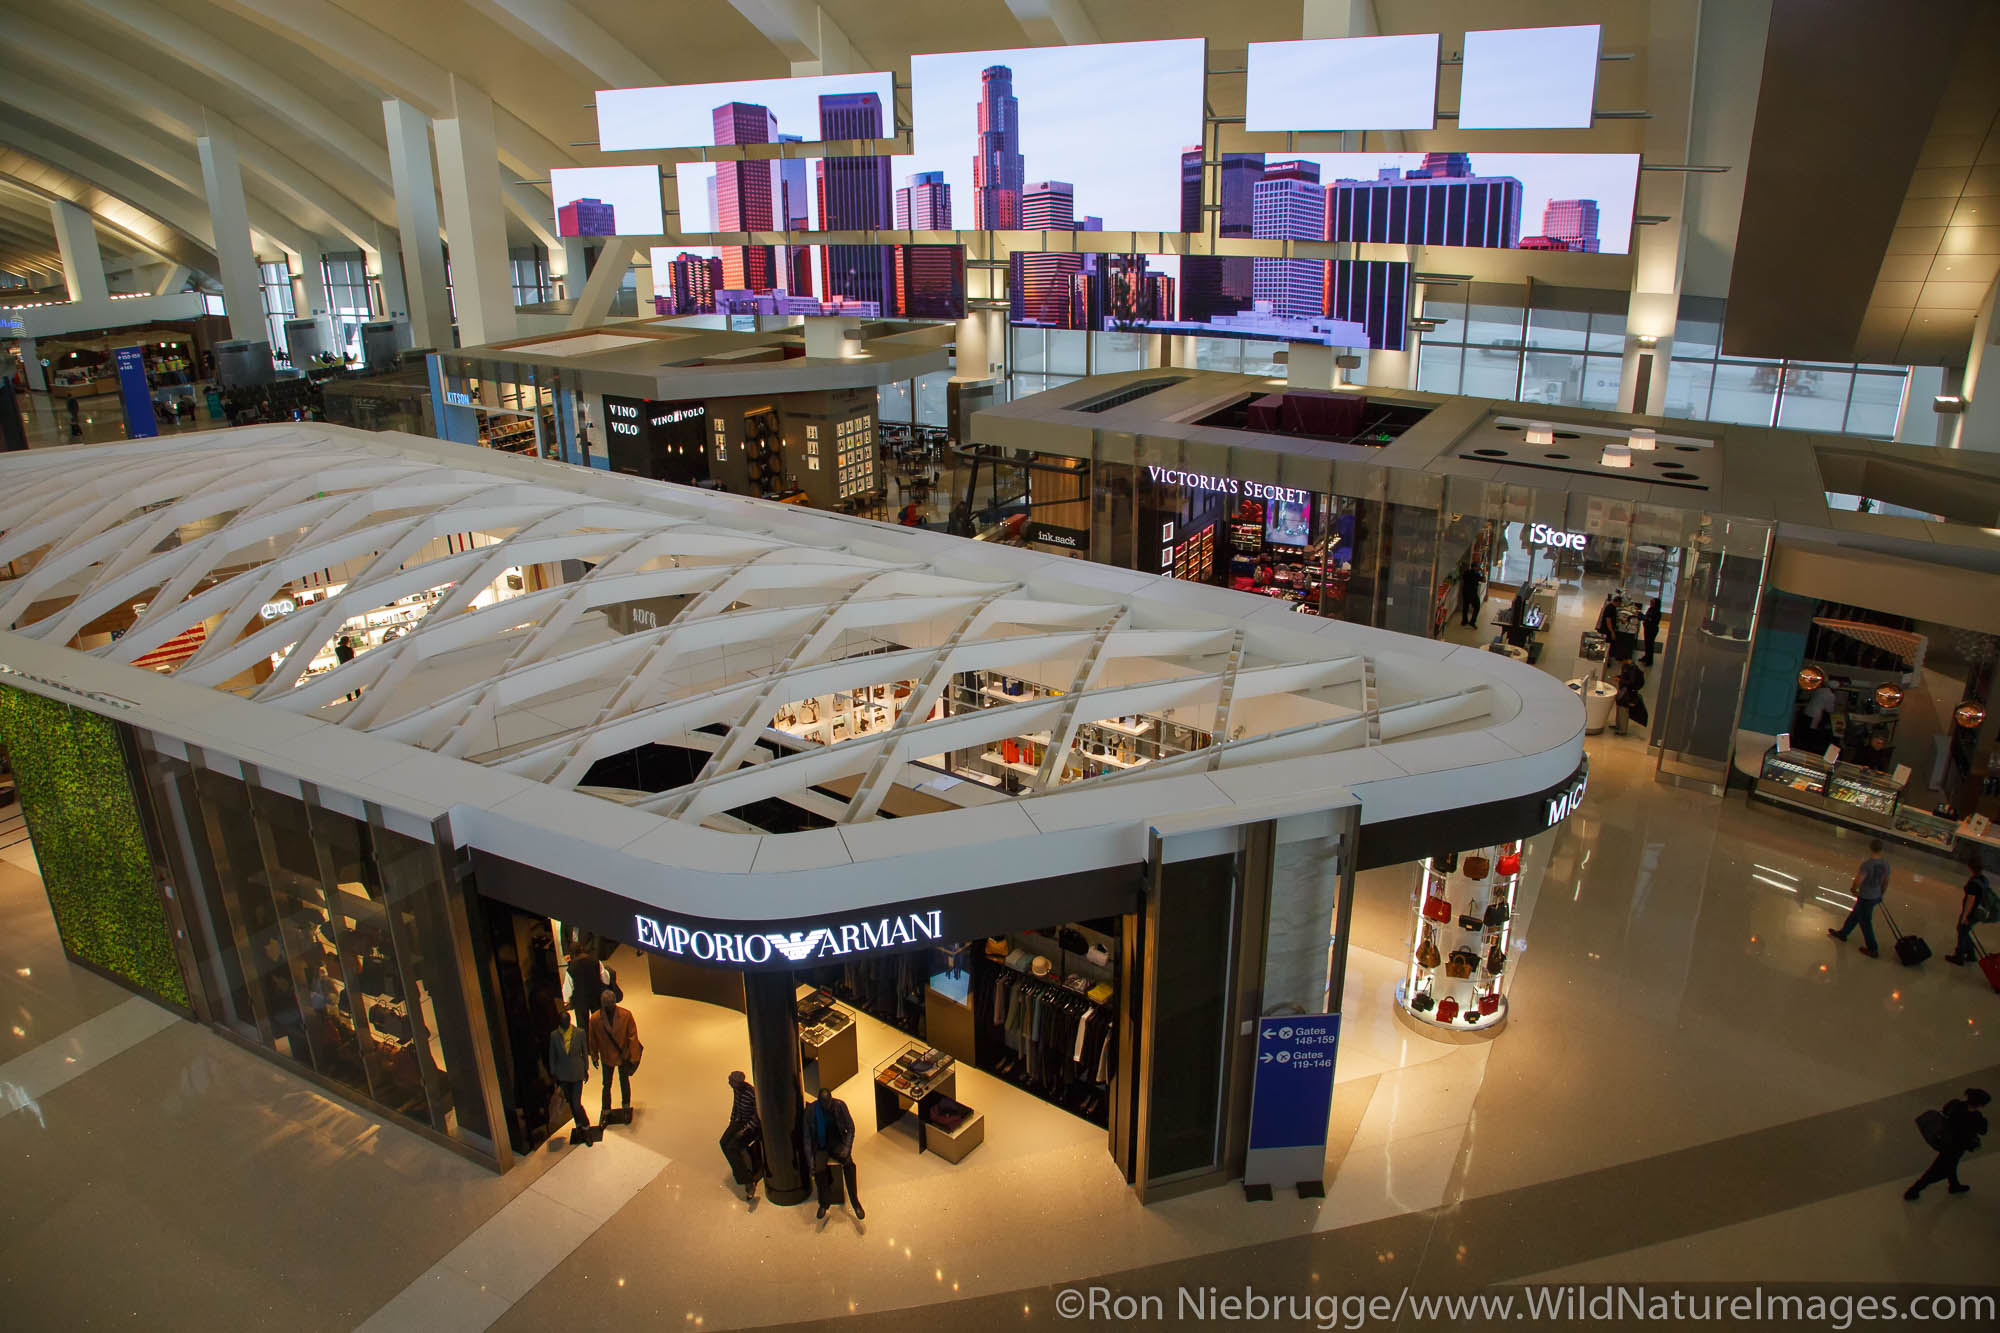 Tom Bradley International Terminal at LAX, Los Angeles, California.